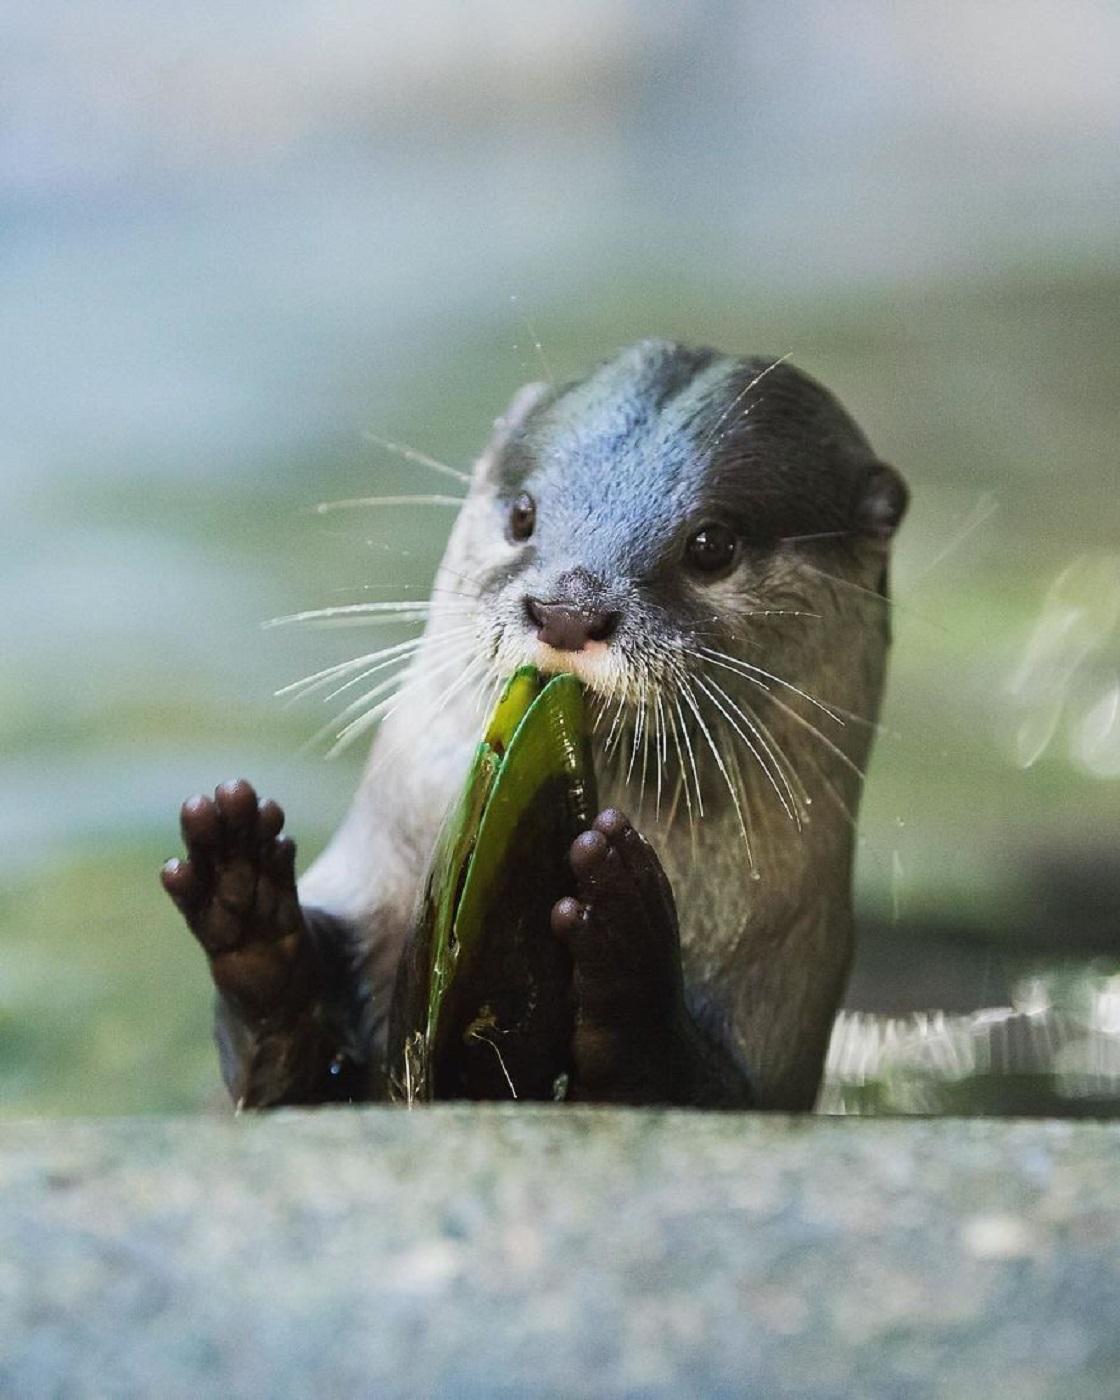 Fotografías de vida salvaje - Robert, hijo de Steve Irwin